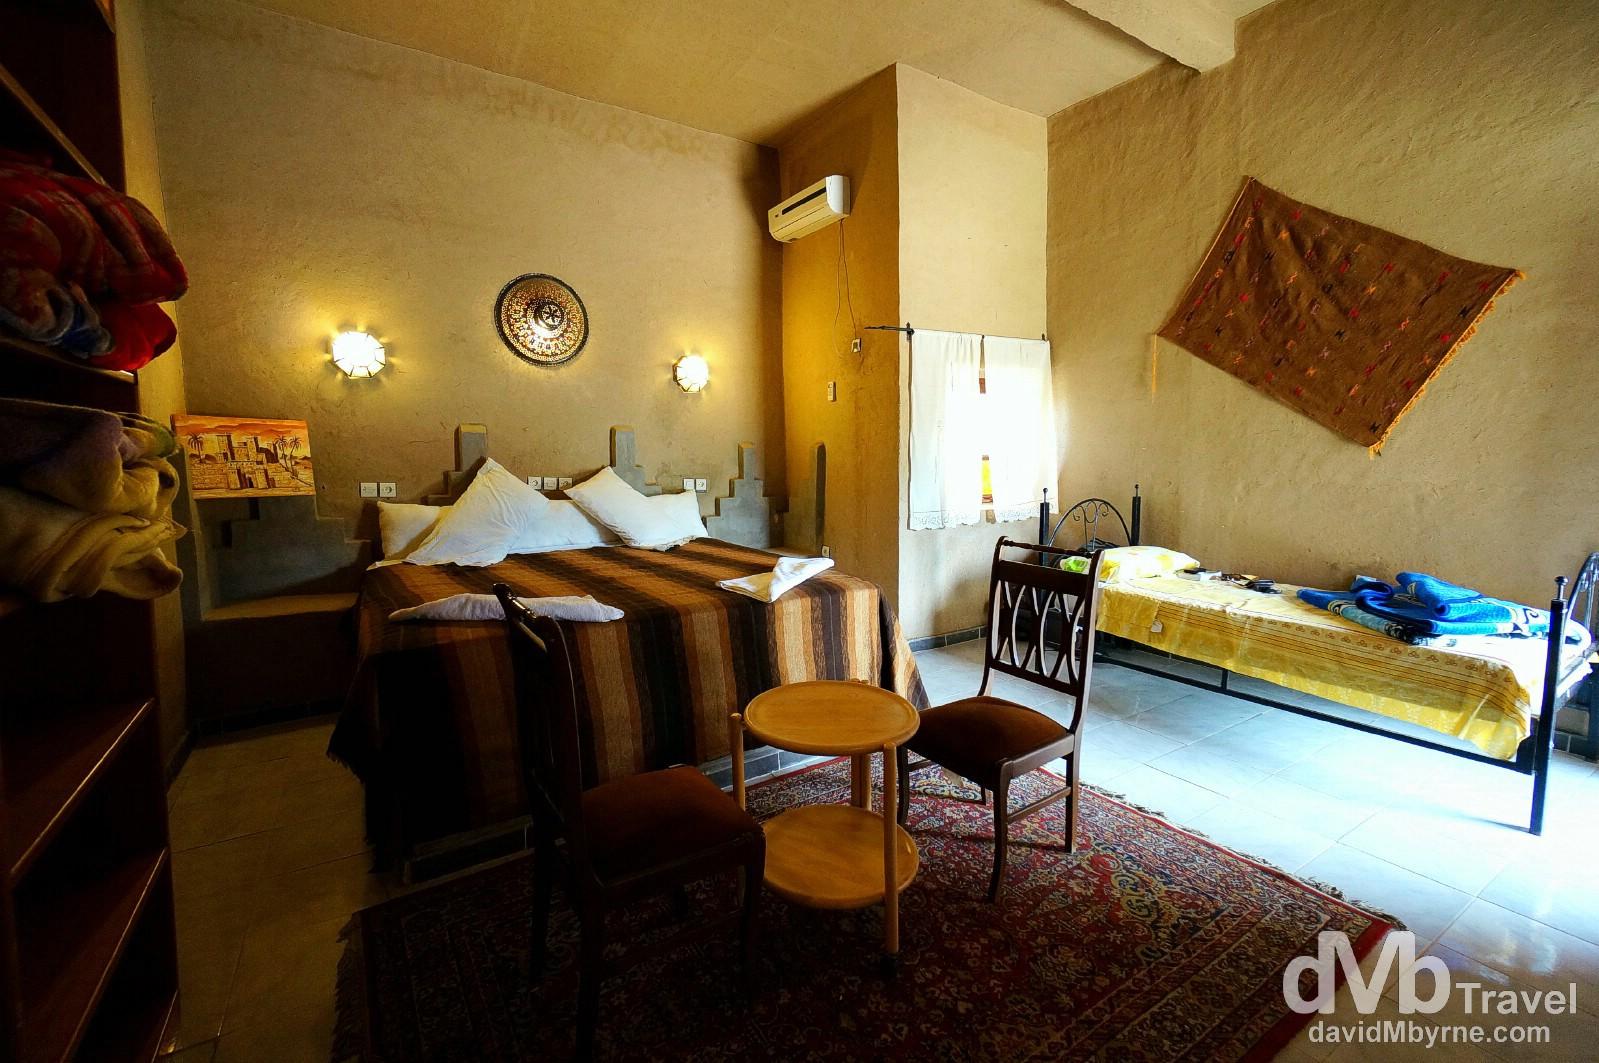 Hotel Haven la Chance/Auberge La Chance, Merzouga, southeastern Morocco. May 21, 2014.